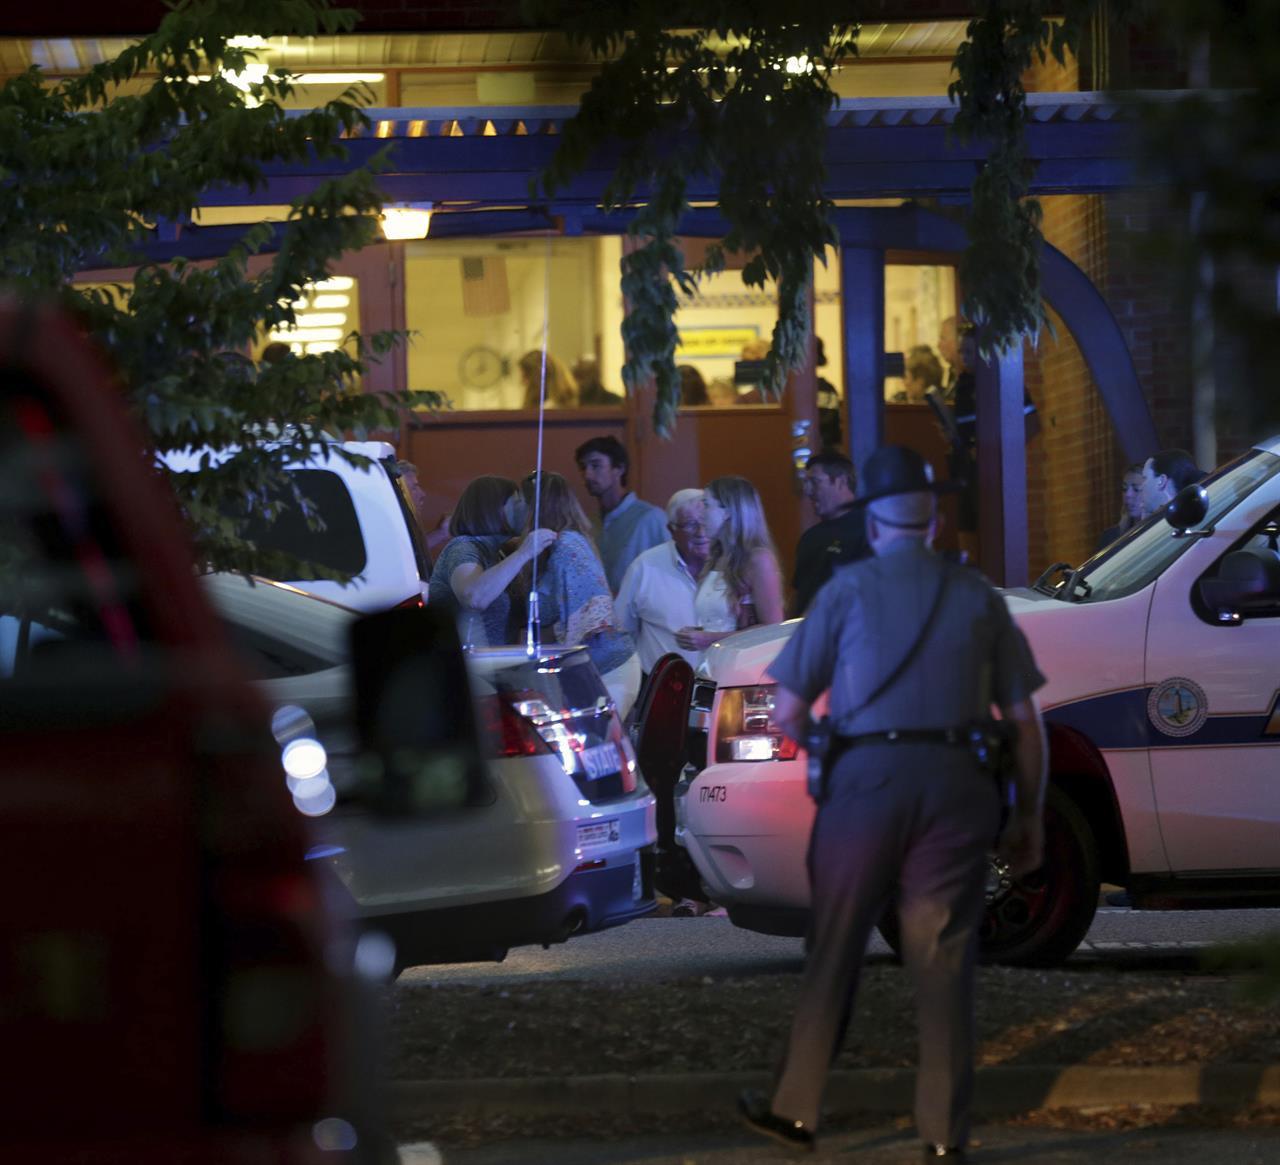 Denver News Shooting: 12 People Killed In Virginia Beach Shooting; Suspect Dead